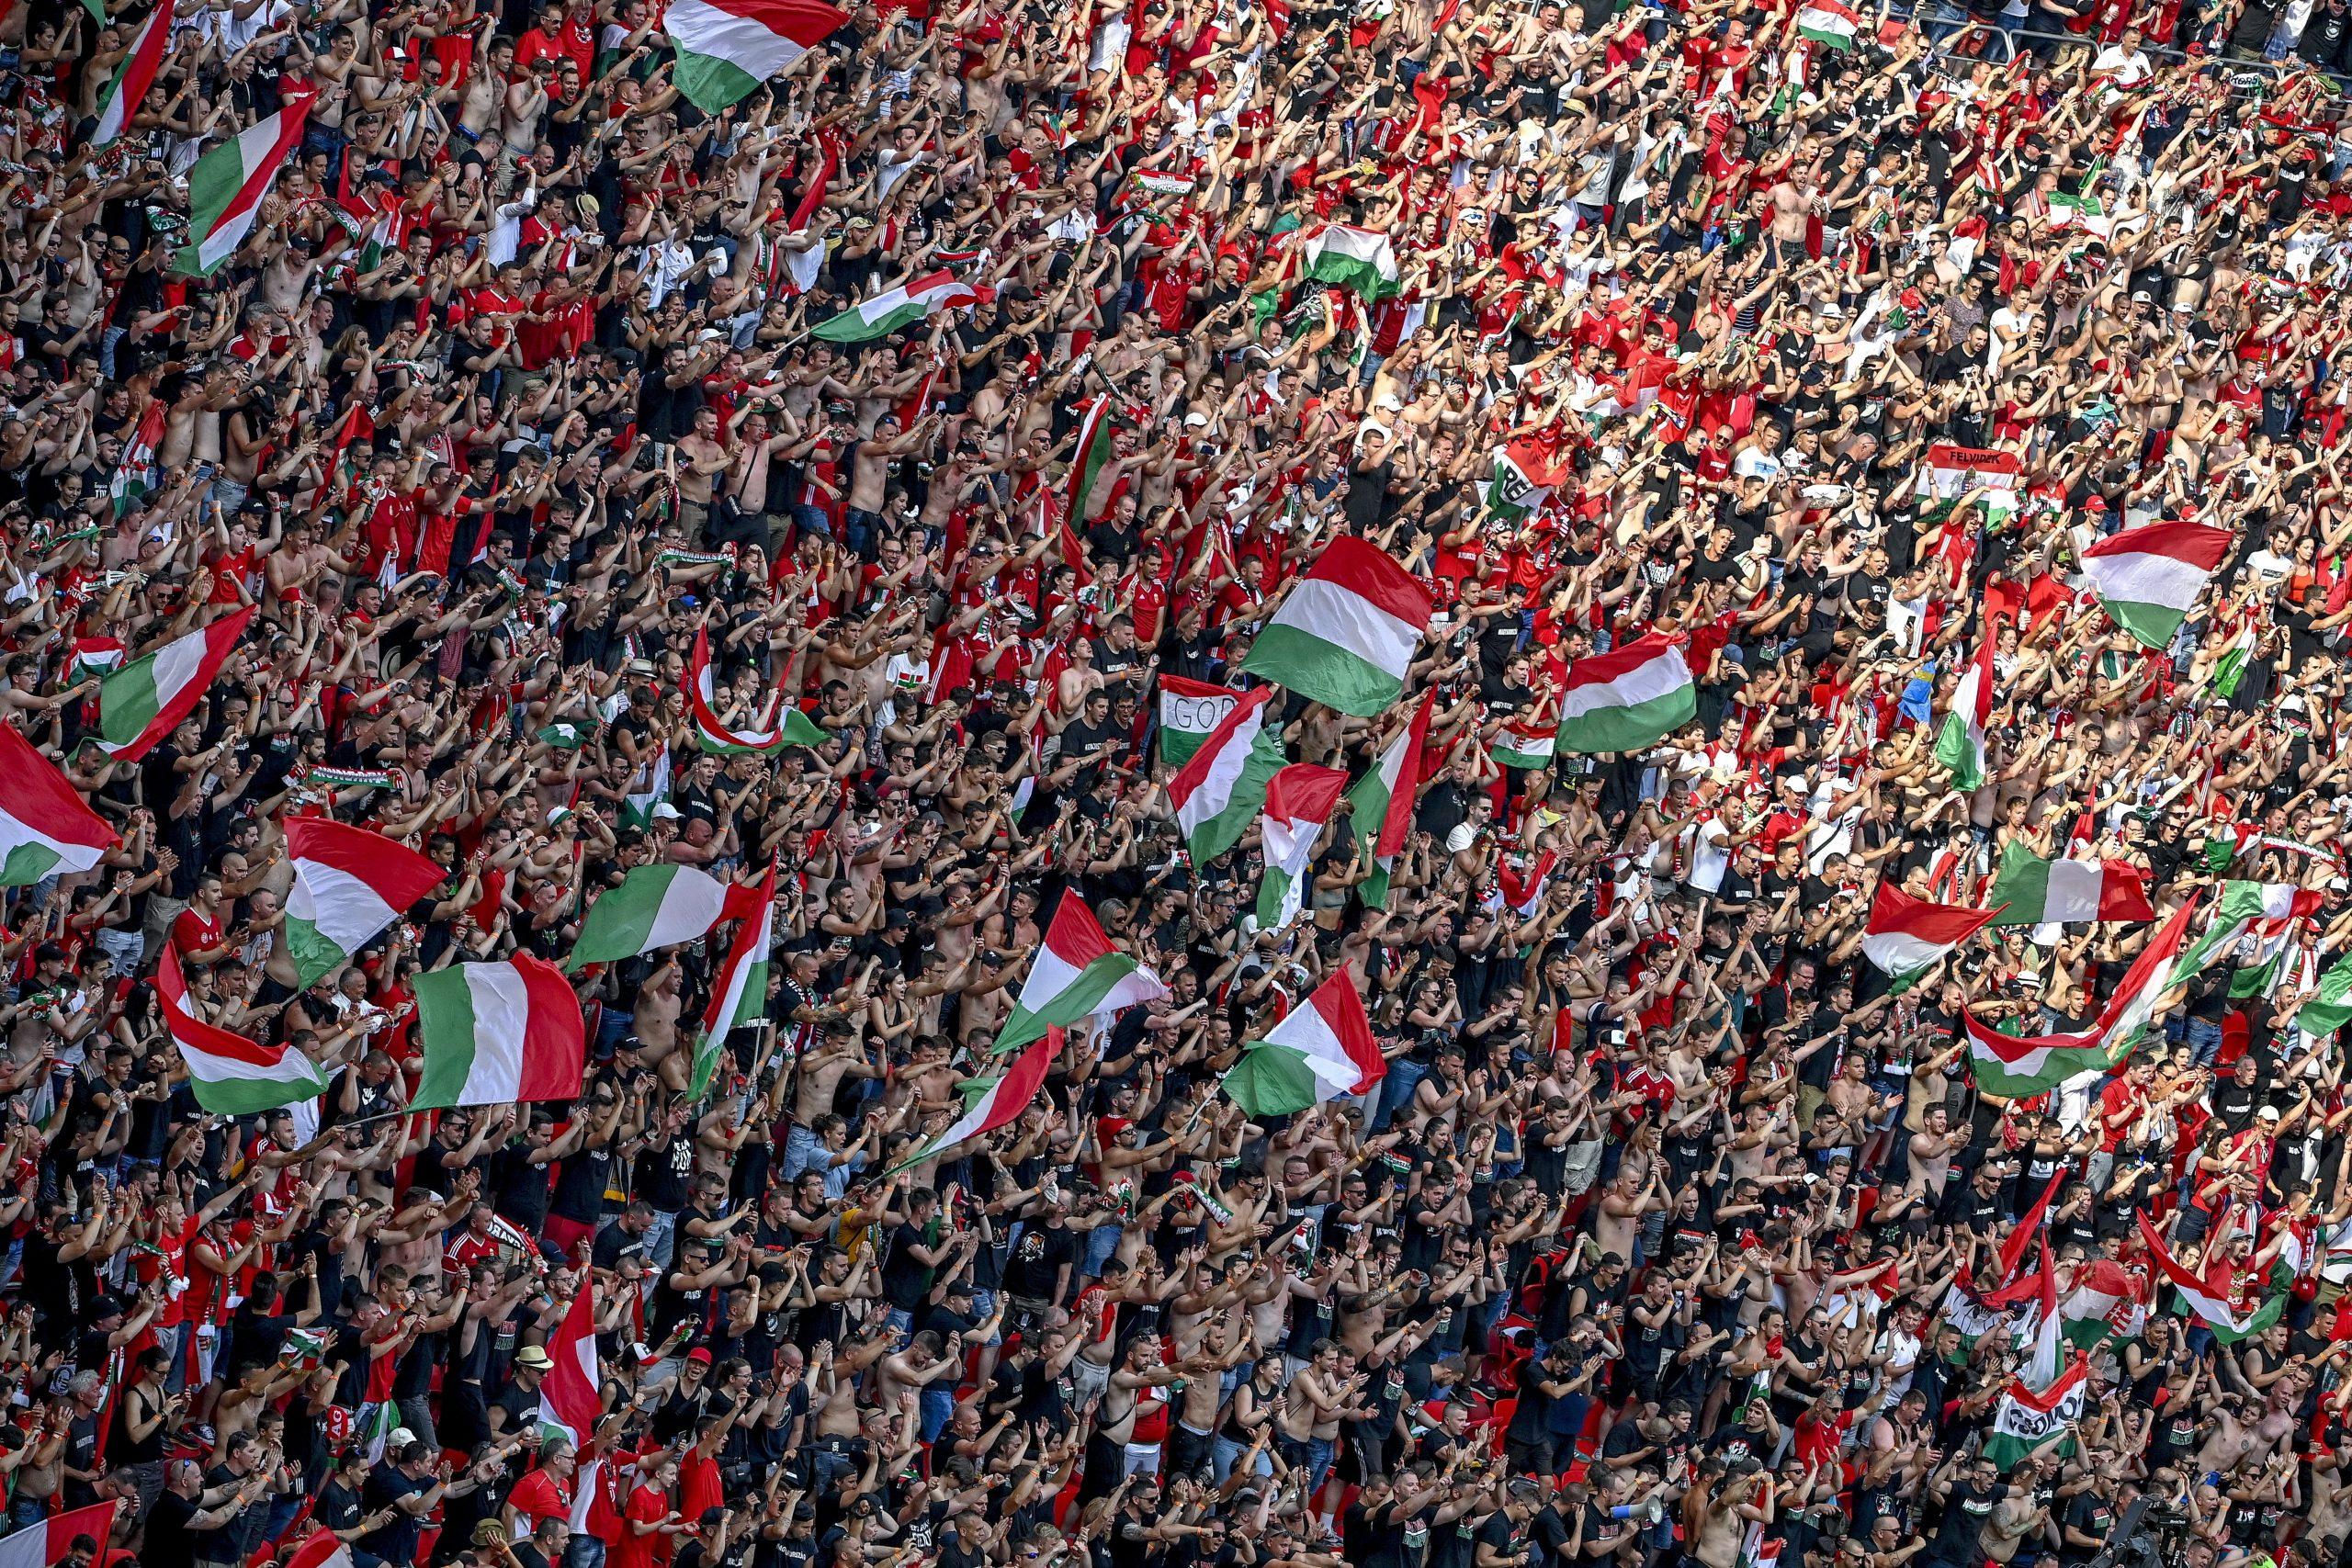 Budapost: UEFA bestraft Ungarn